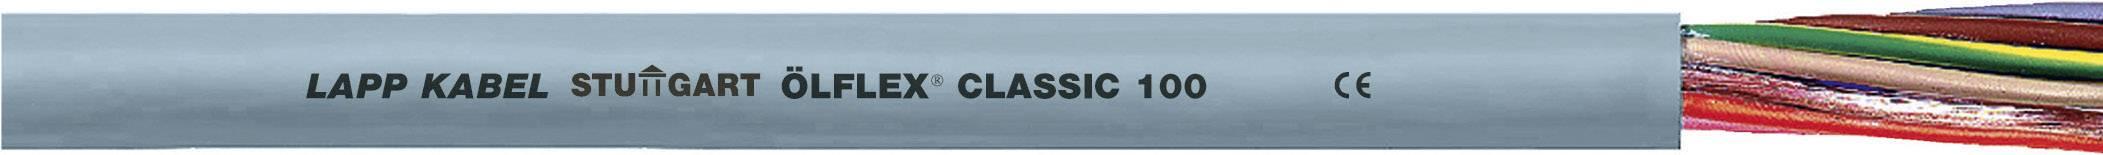 Kabel LappKabel Ölflex CLASSIC 100 3X0,5 (00101224), PVC, 5,1 mm, 500 V, šedá, 50 m